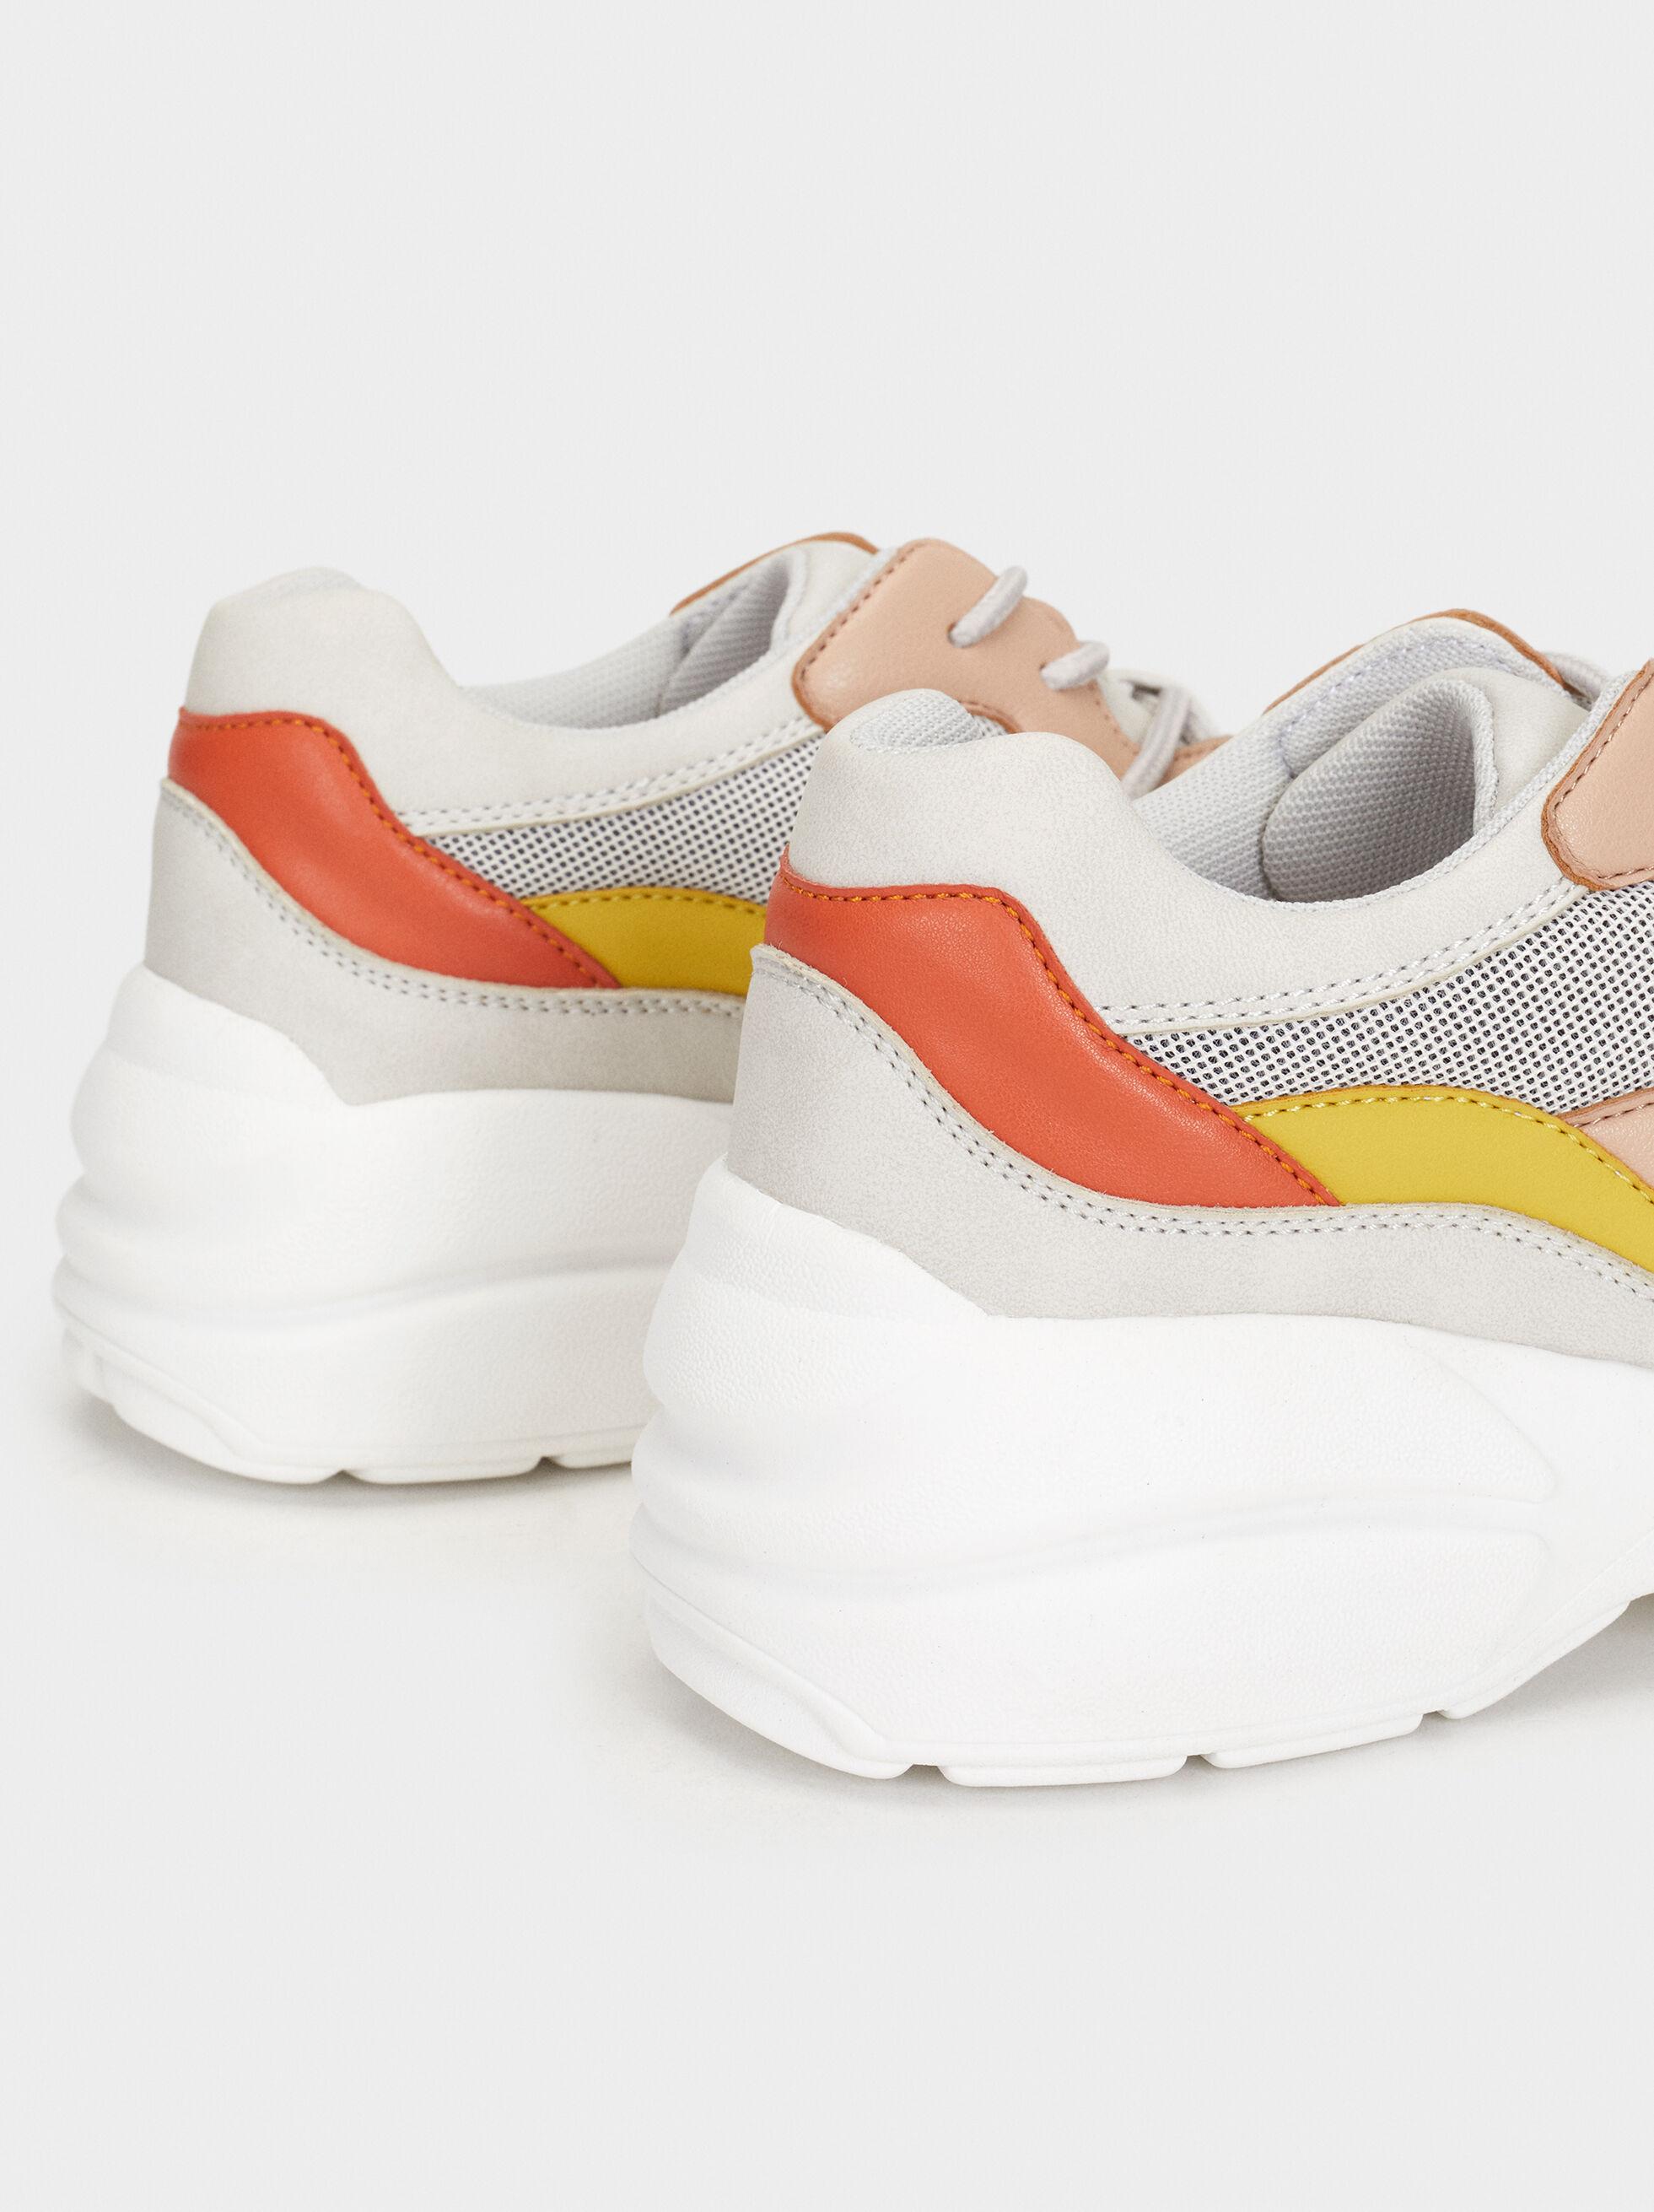 Maxi Sole Trainers, Multicolor, hi-res